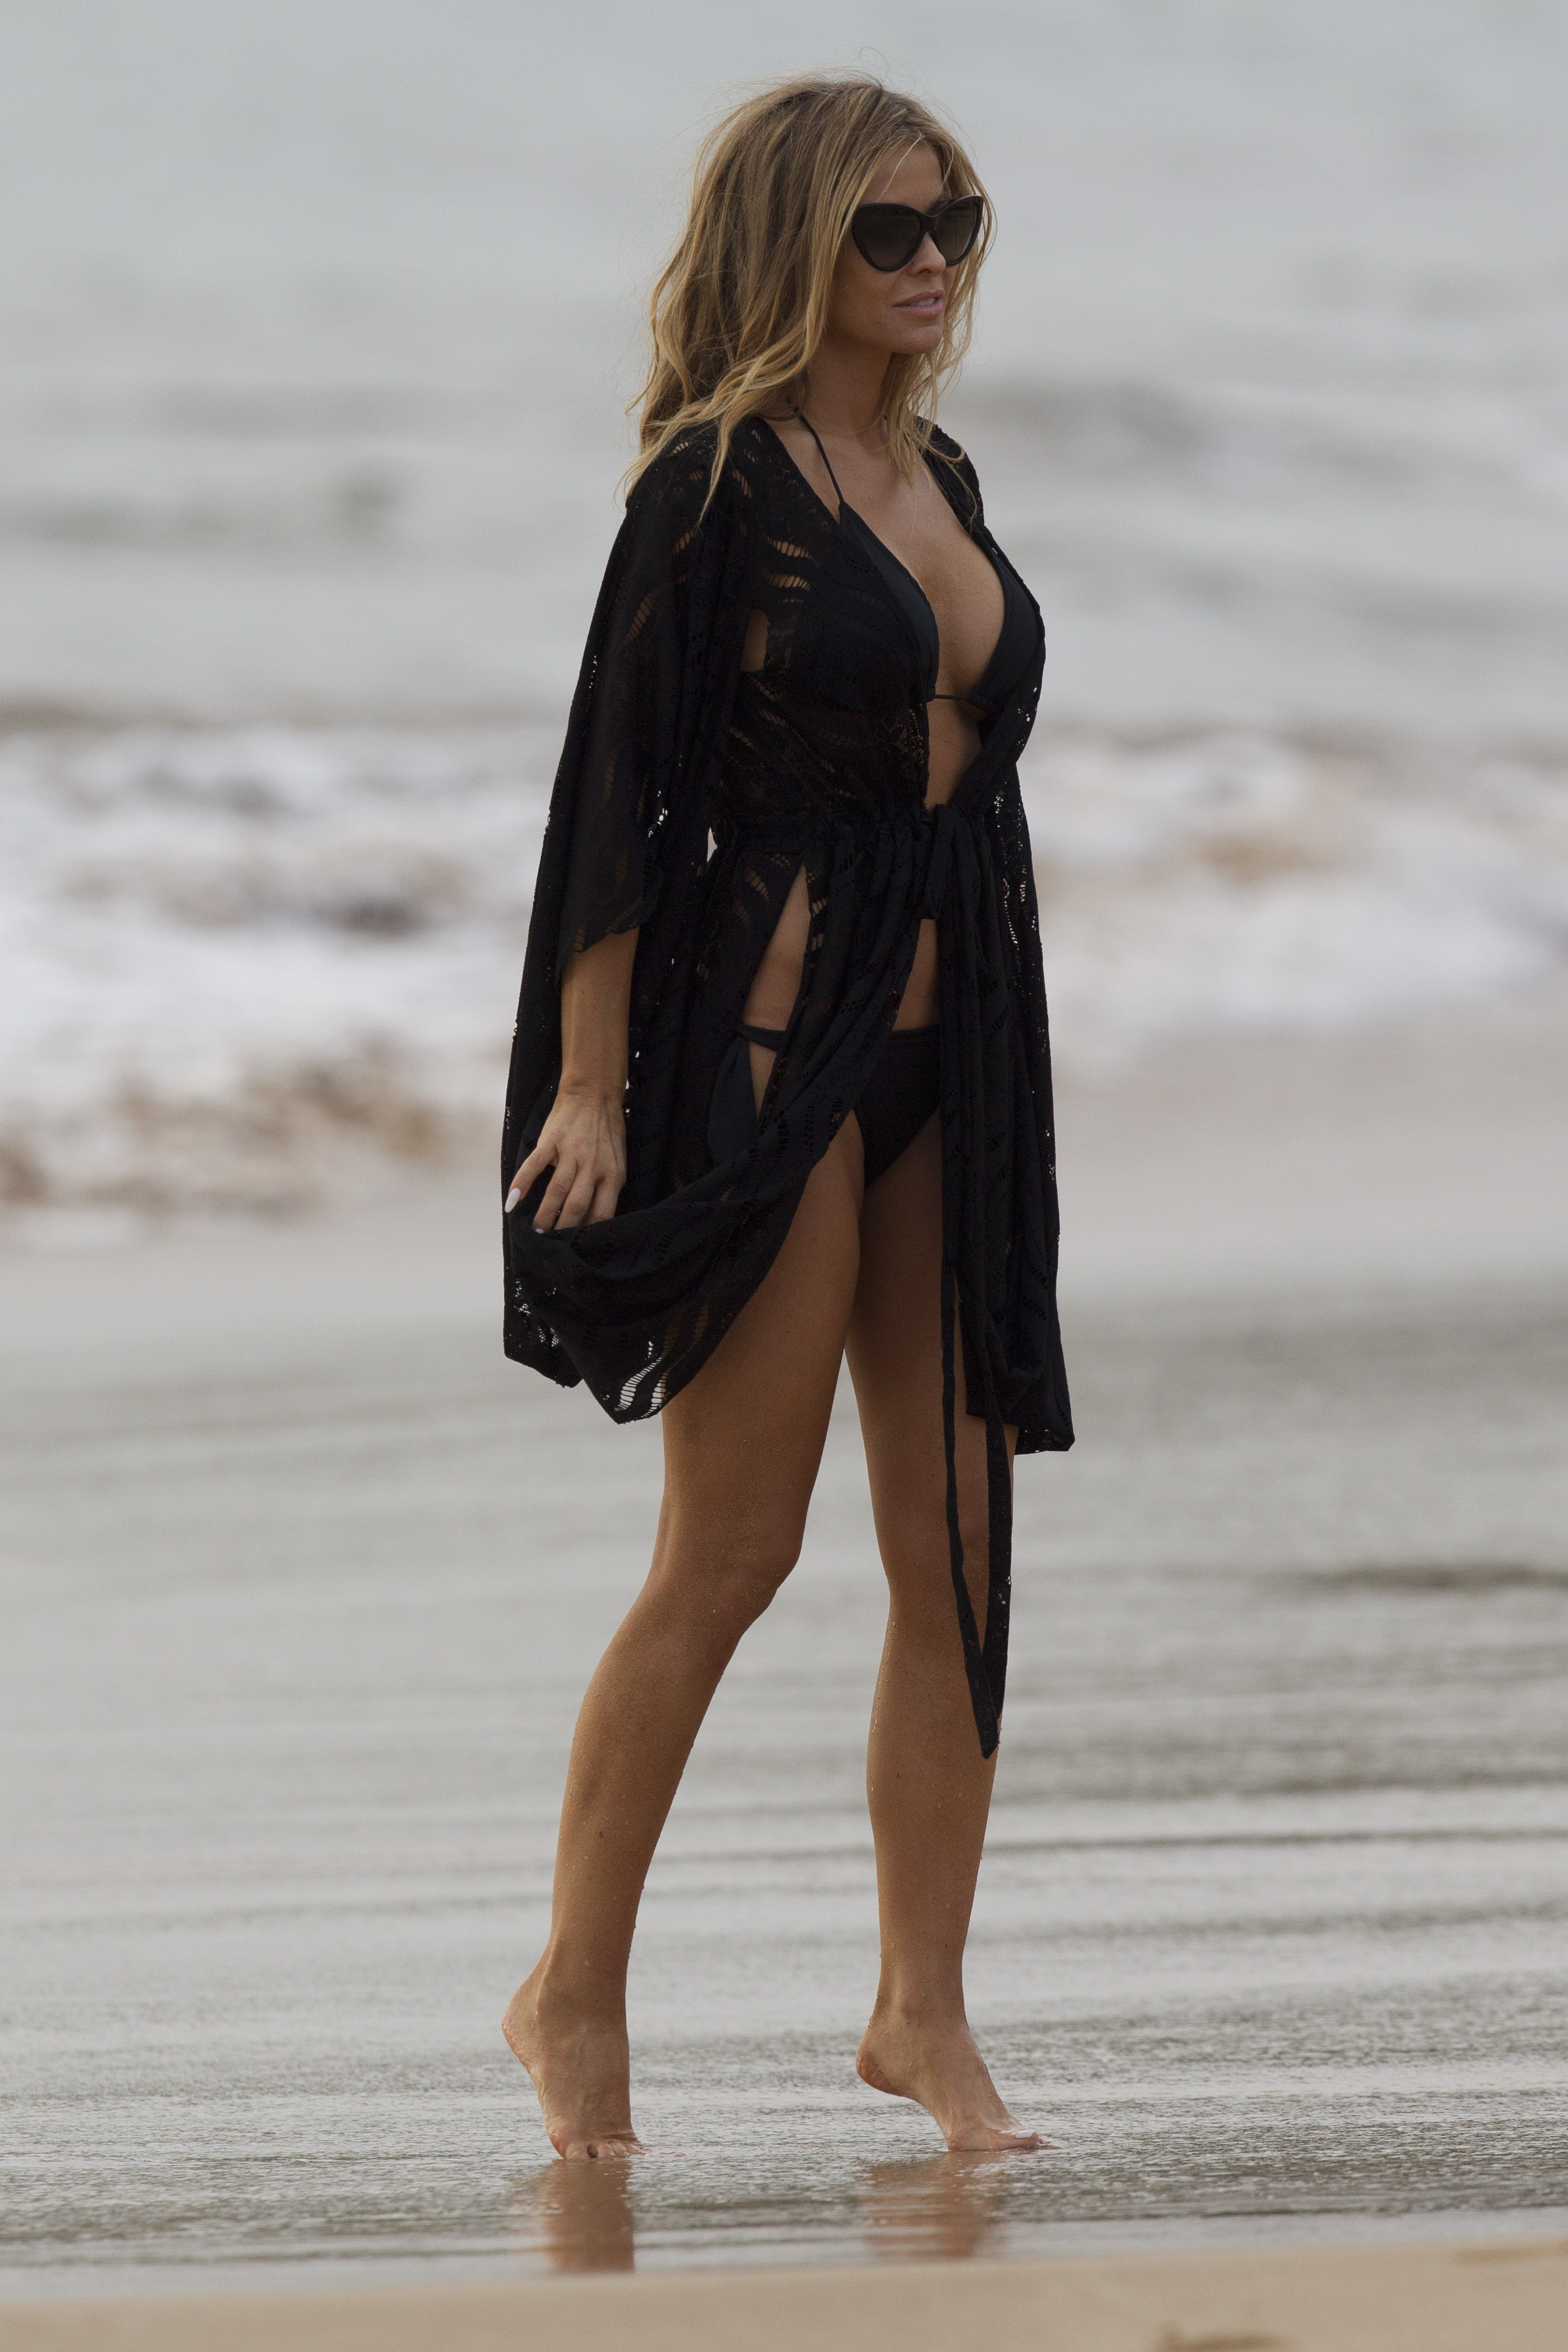 barefoot Carmen electra